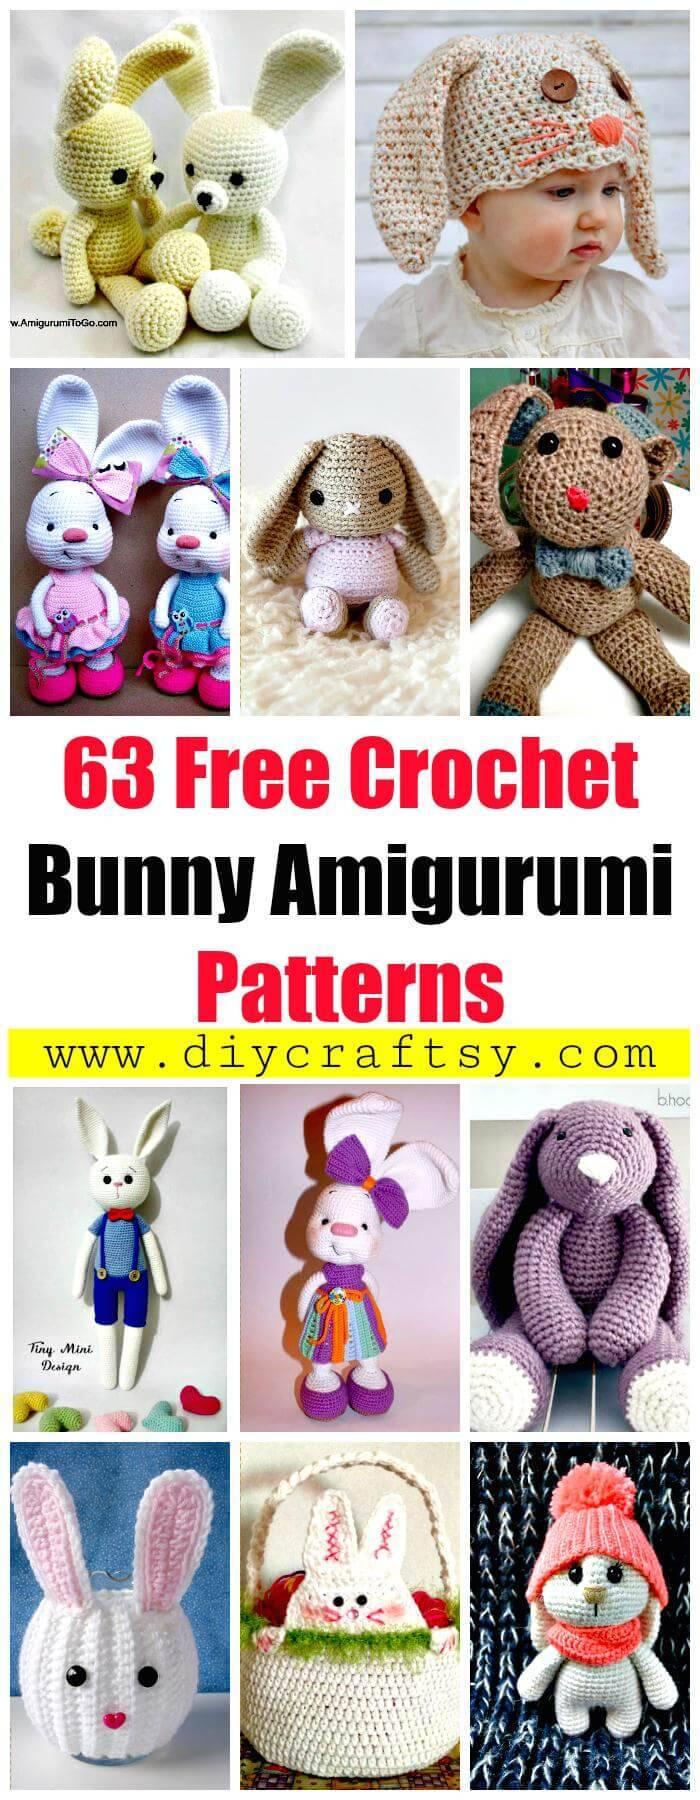 63 Free Crochet Bunny Amigurumi Patterns - Free Crochet Patterns - Crochet Amigurumi Patterns